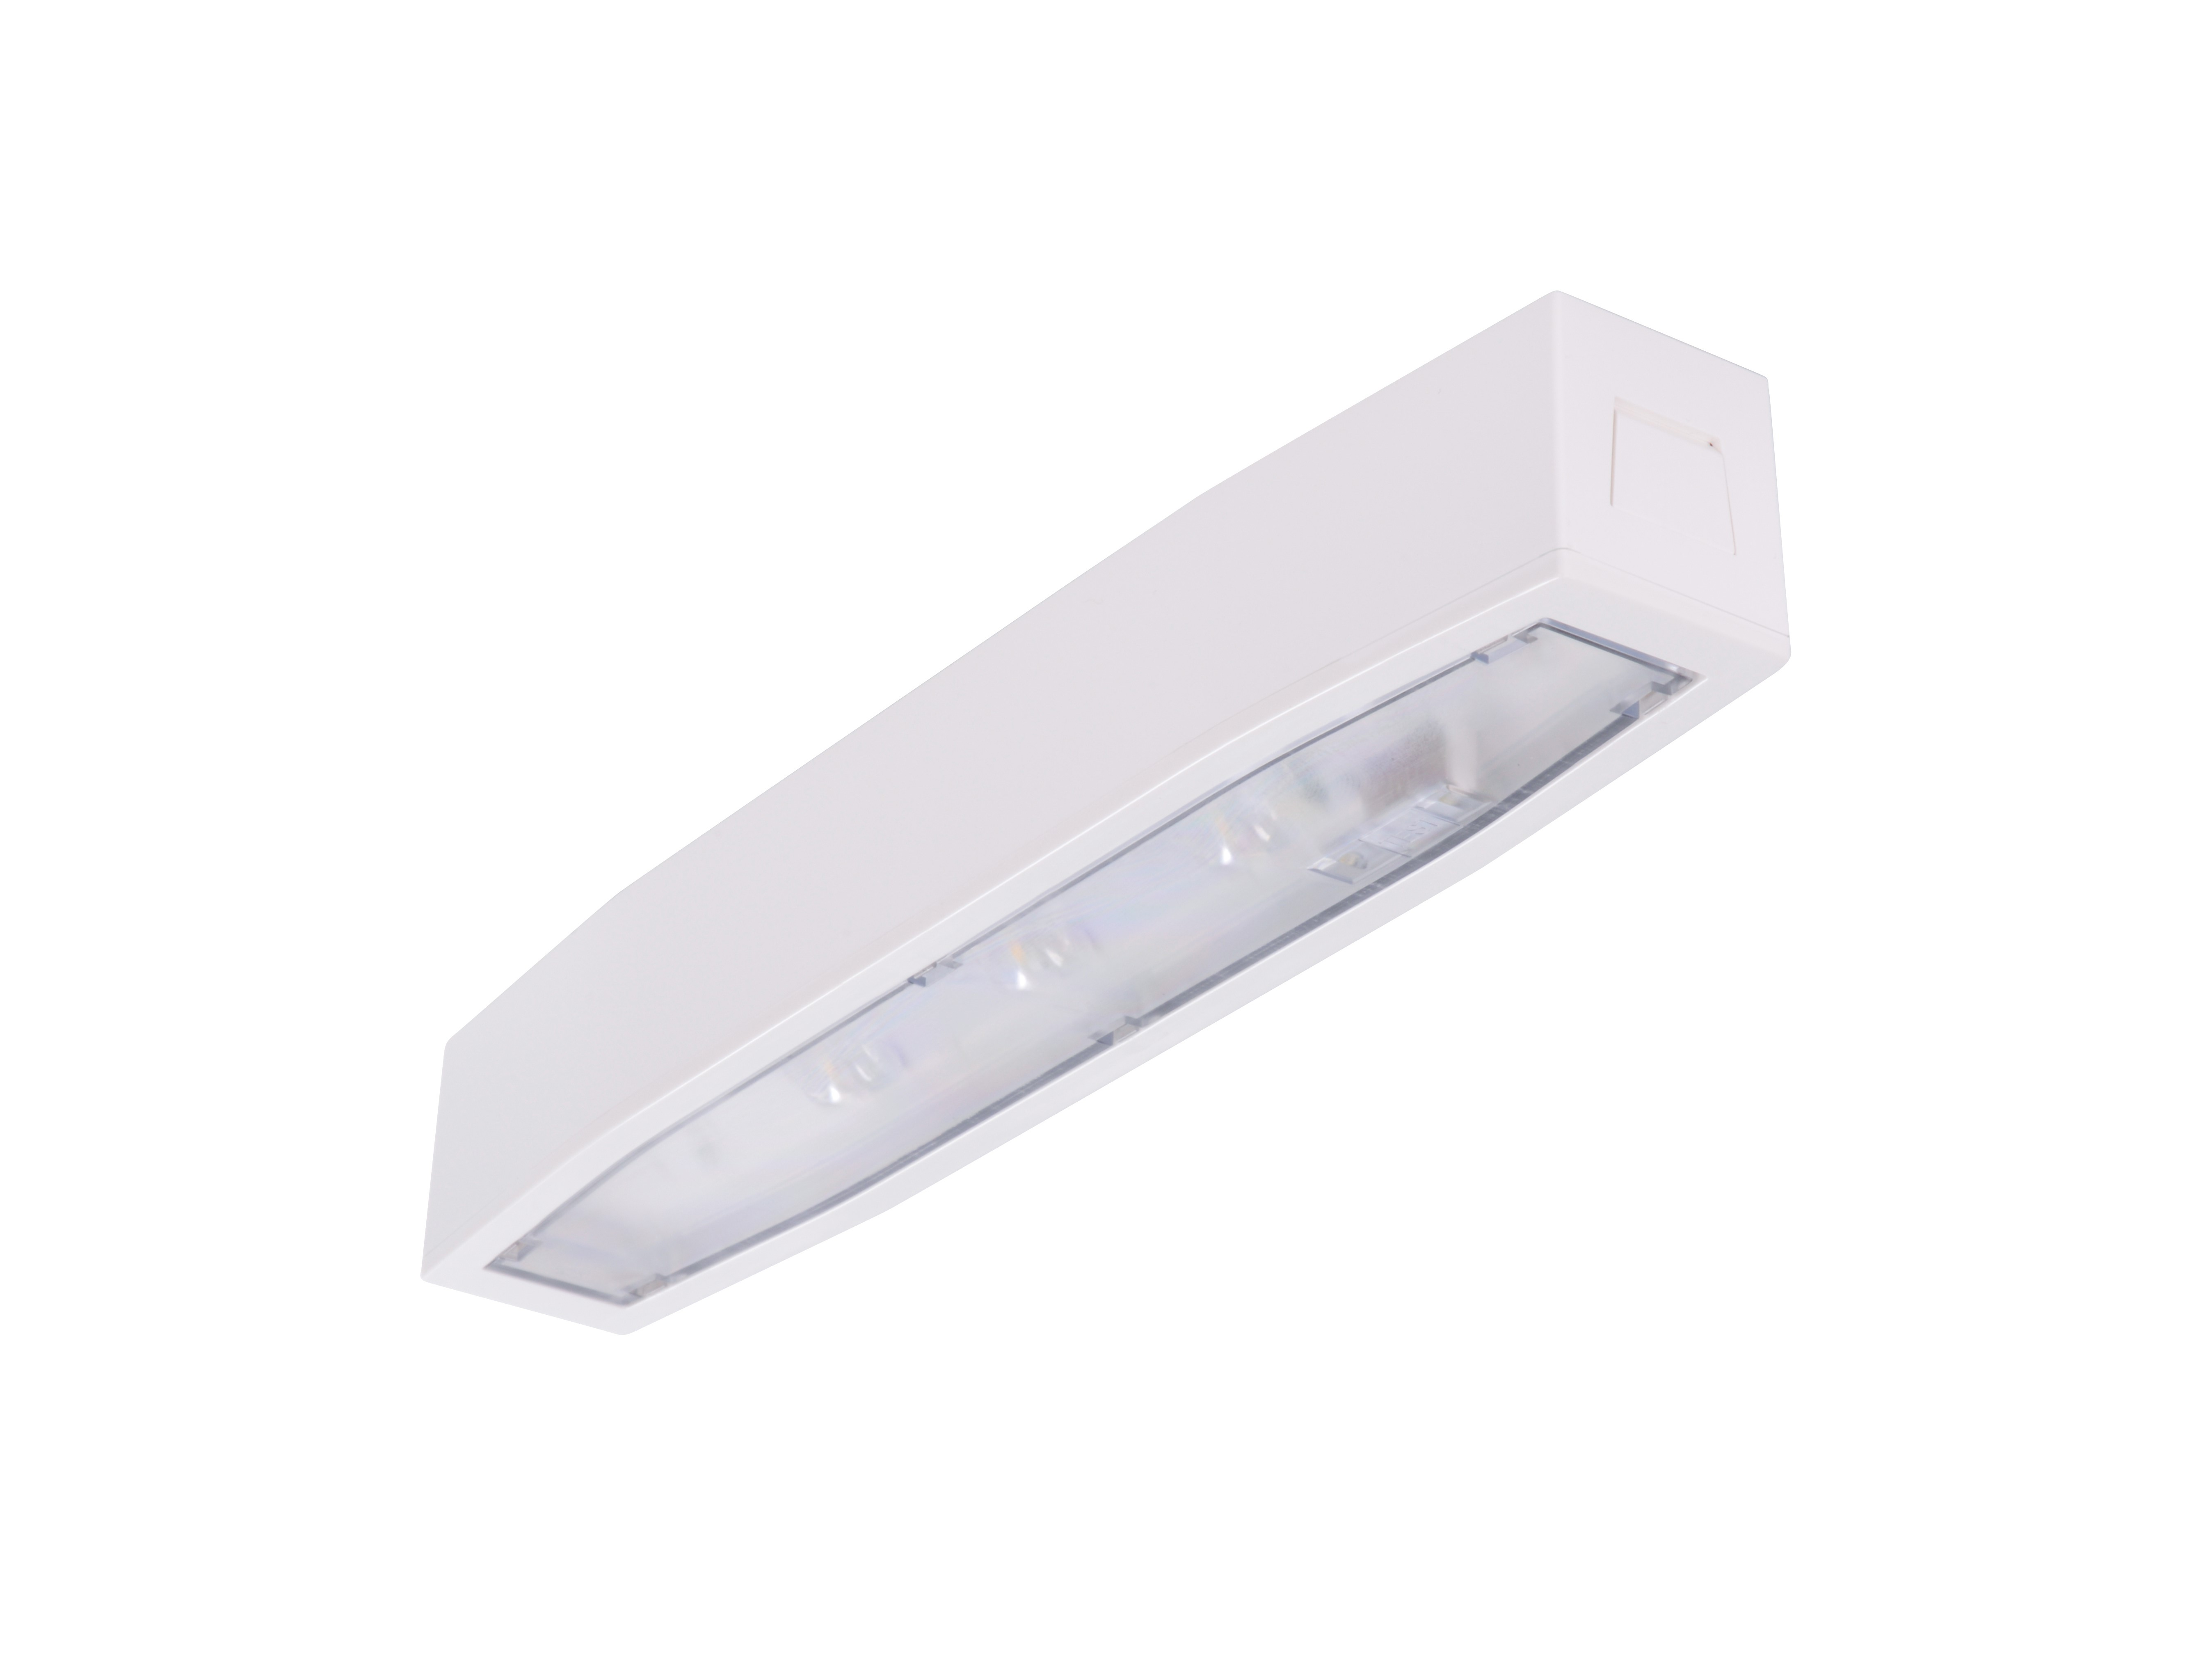 Lampa antipanica led Intelight 94756   3h mentinut test automat 0